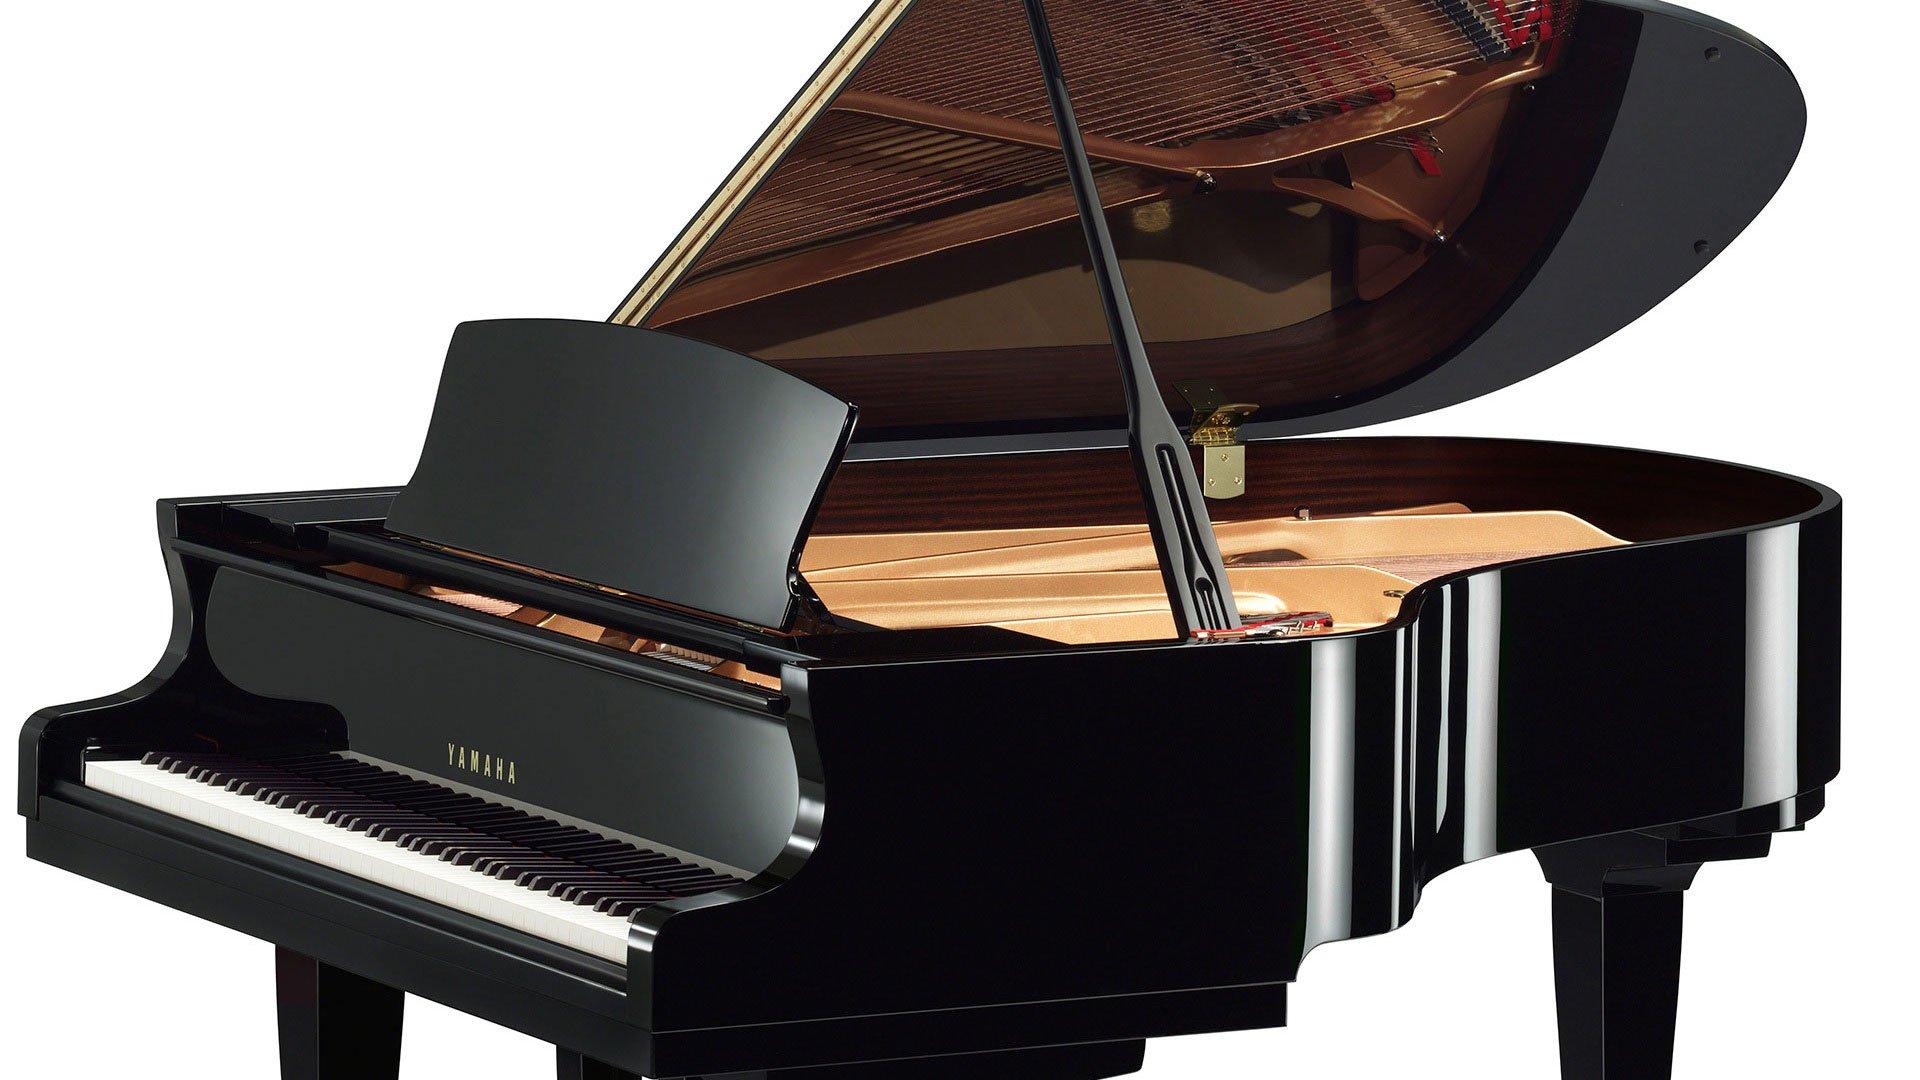 Yamaha Disklavier DS3XENPRO